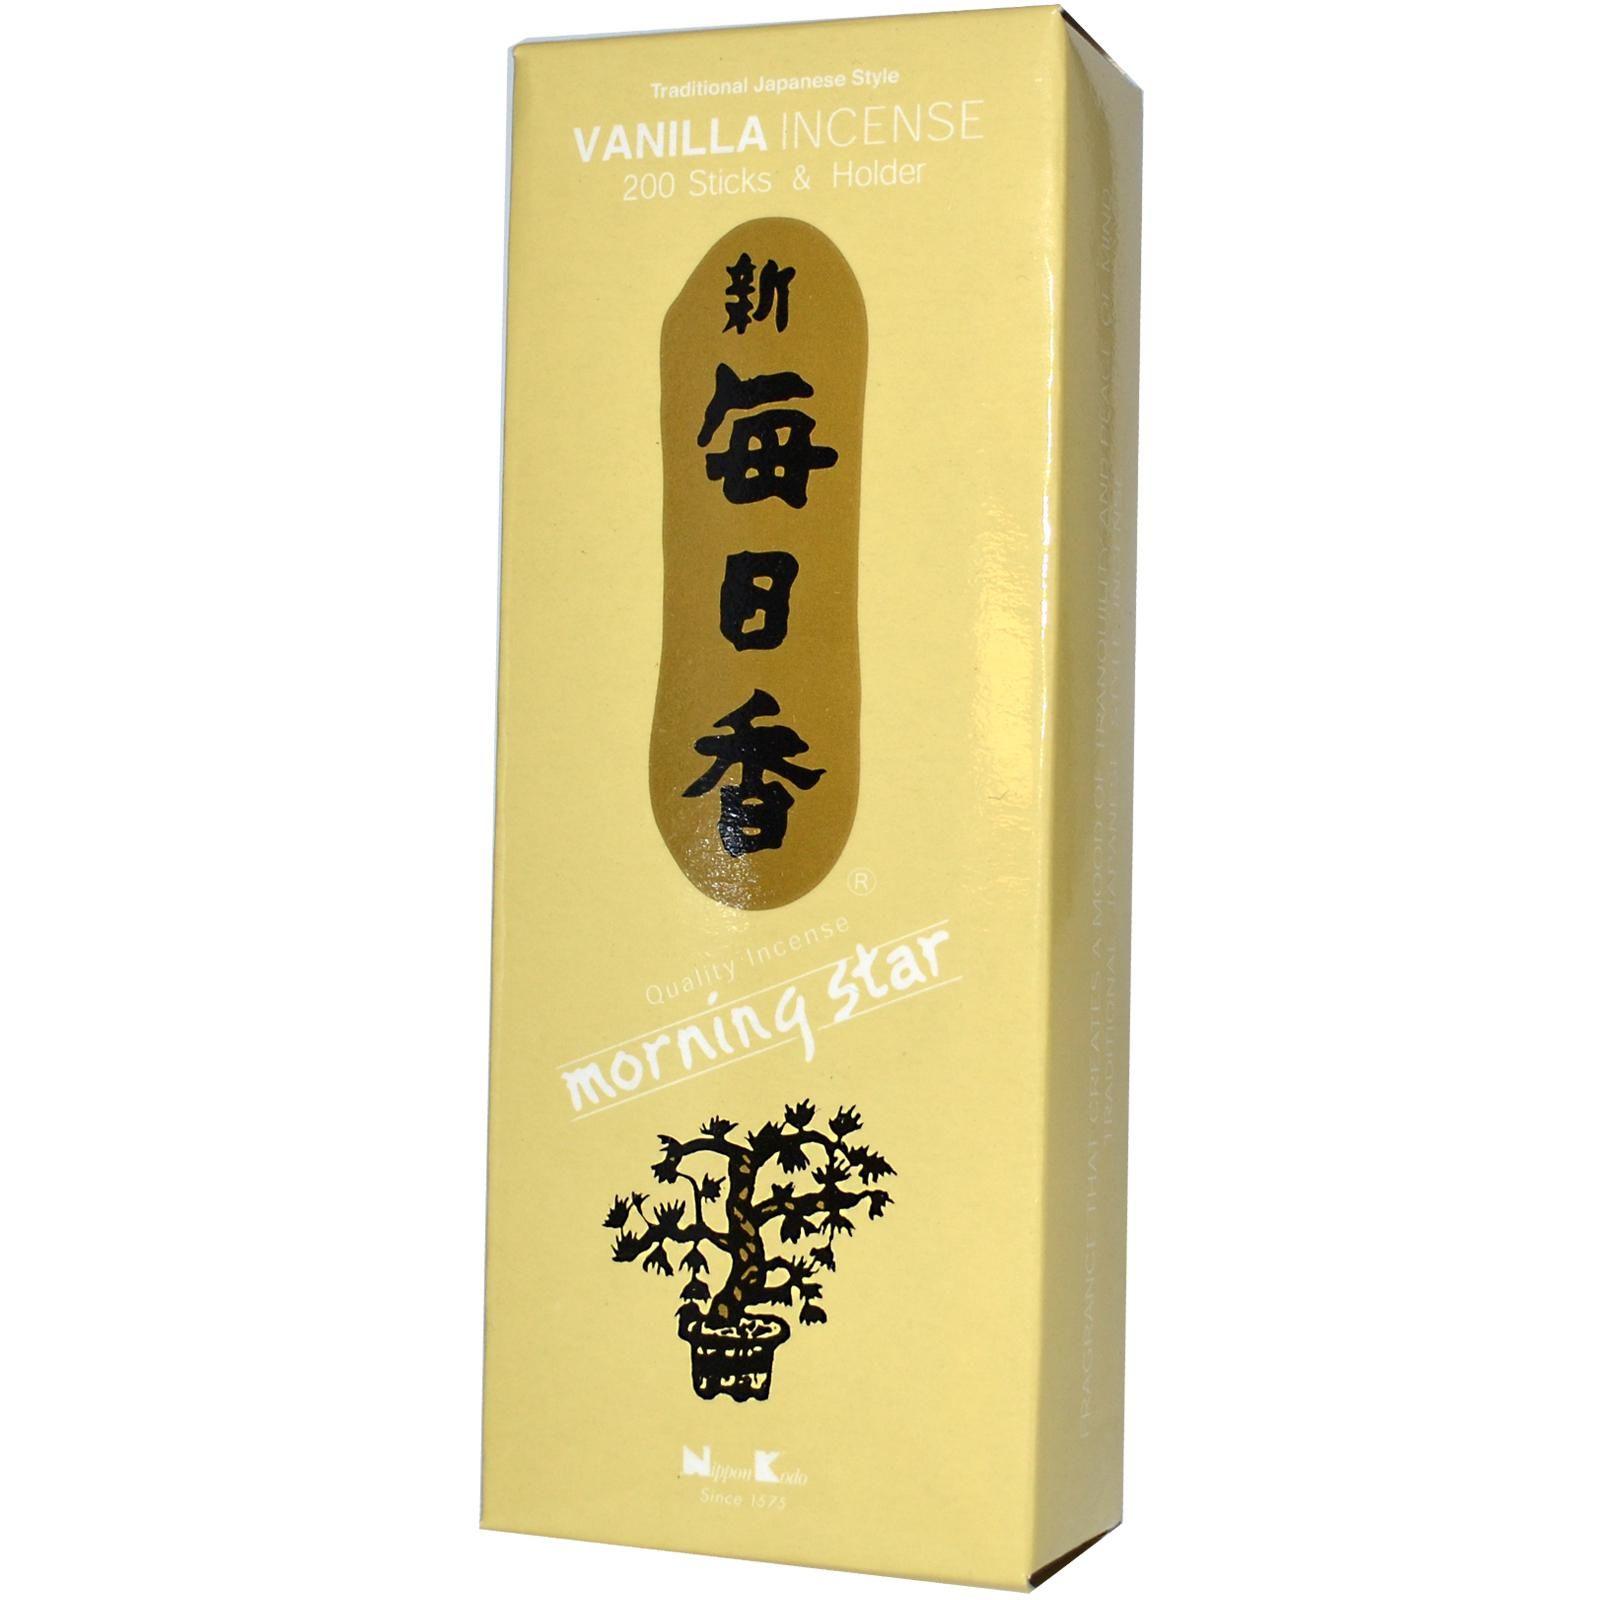 Nippon Kodo, Morning Star, Vanilla Incense, 200 Sticks